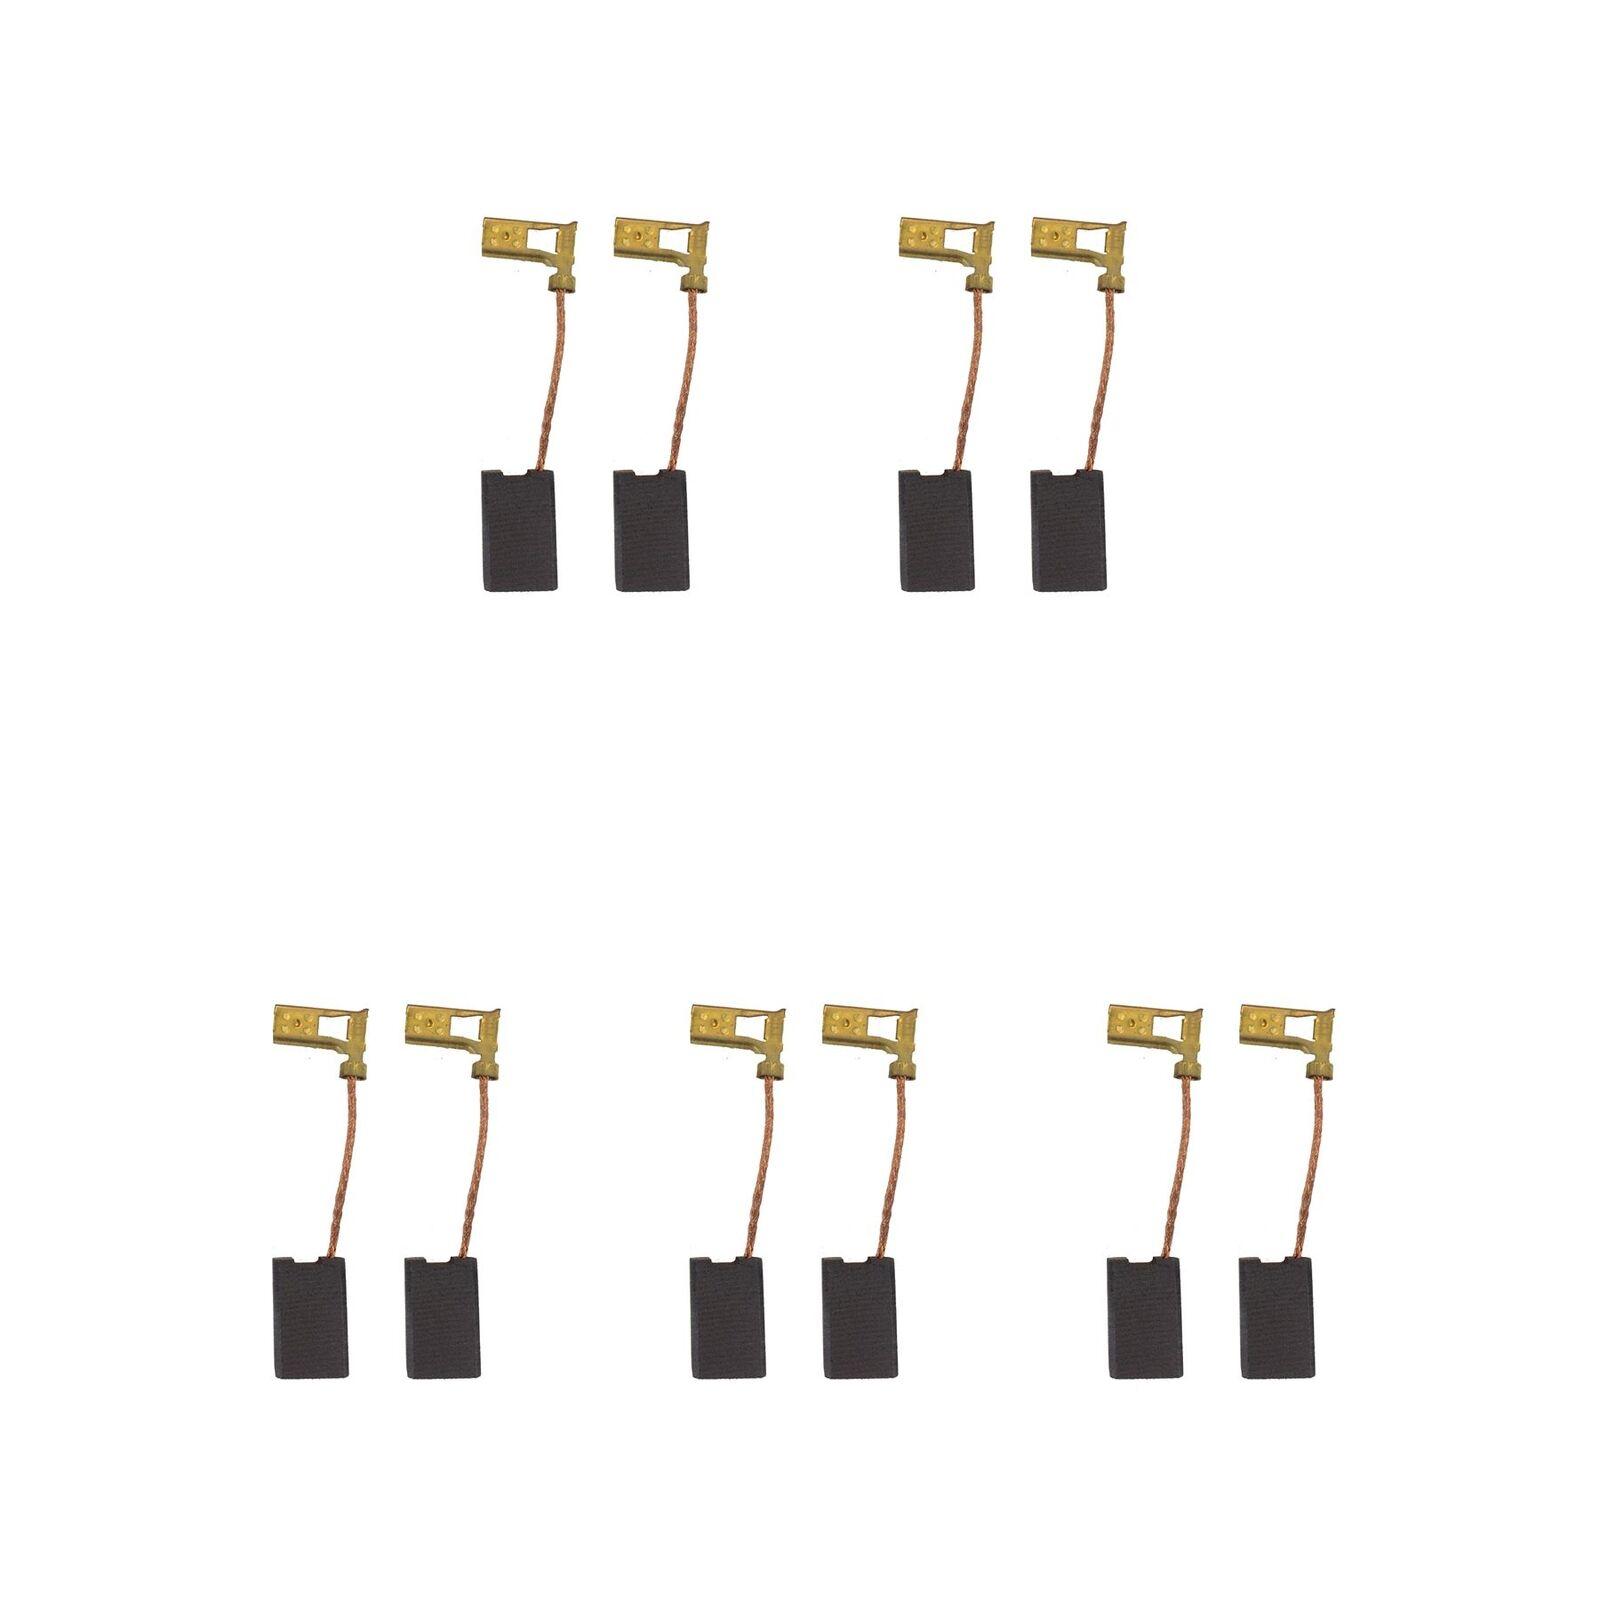 5 Sets of - 2x Carbon Brushes - Aeg A43 Mini Grinder (Größe - 6.3 X 10 X 16)